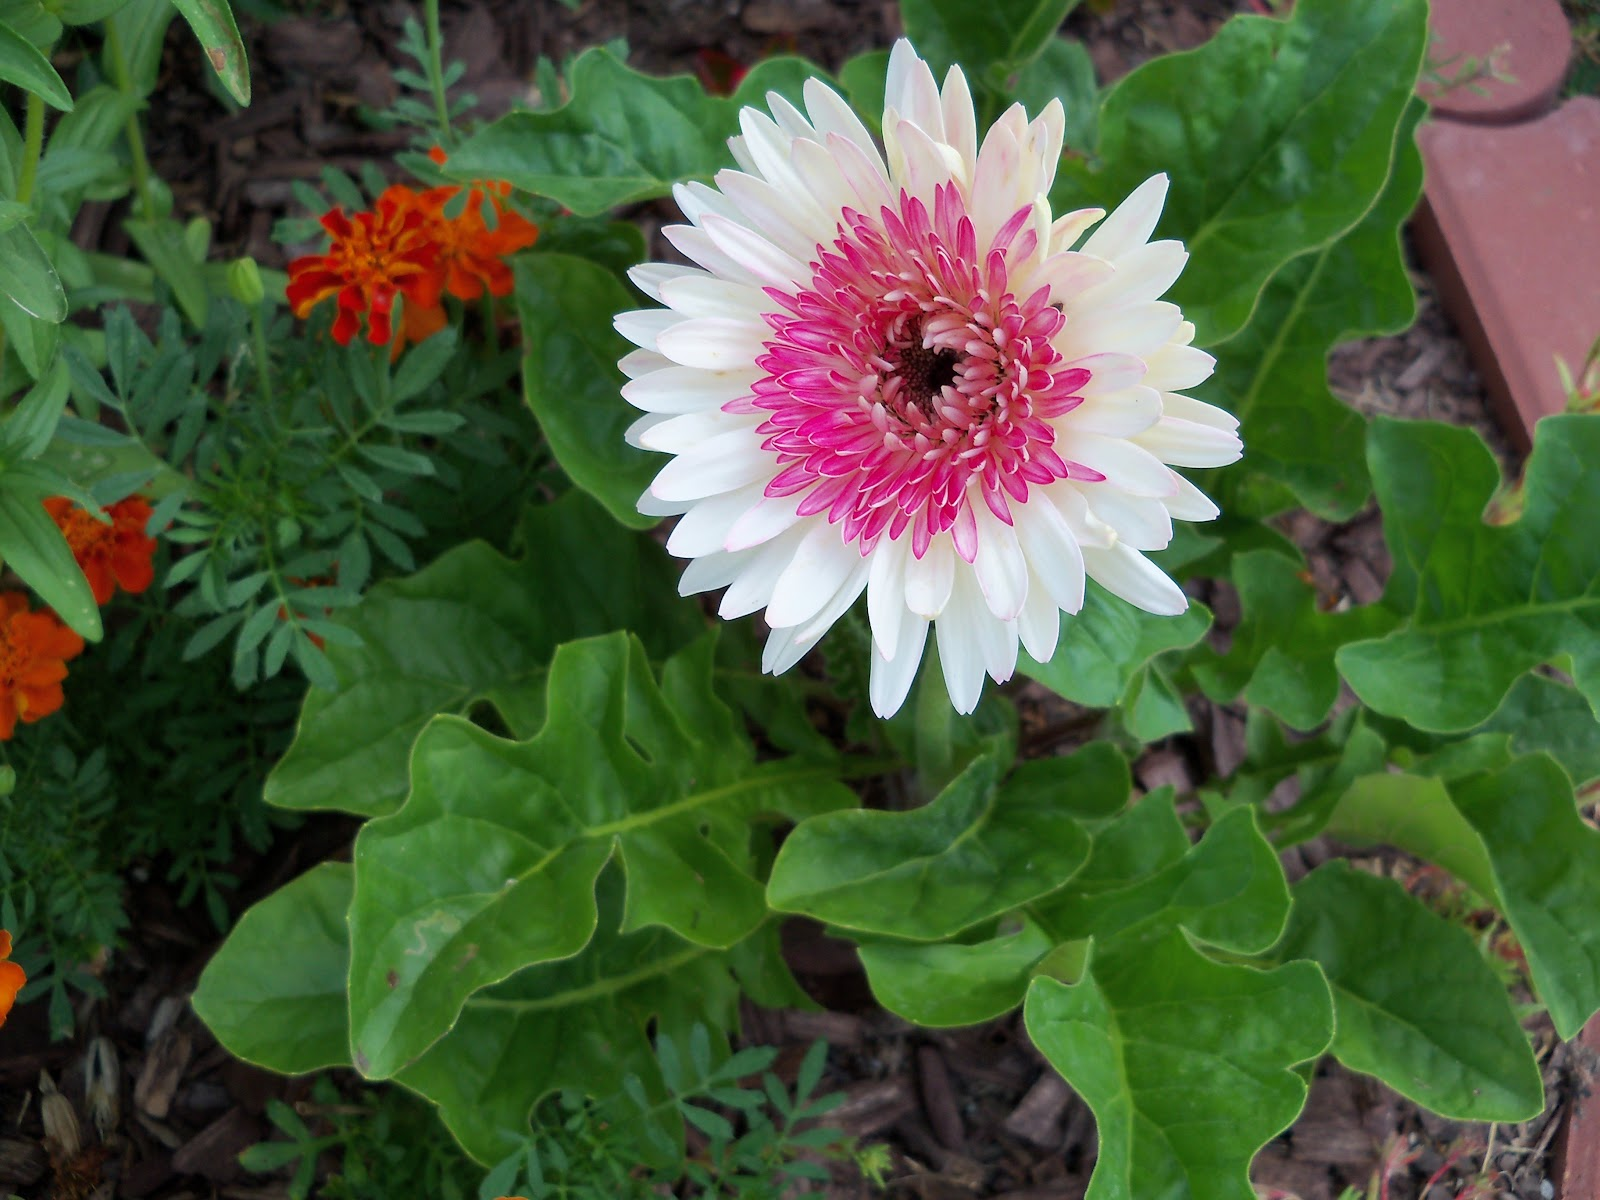 Gardening 2010, Part Two - 101_2991.JPG